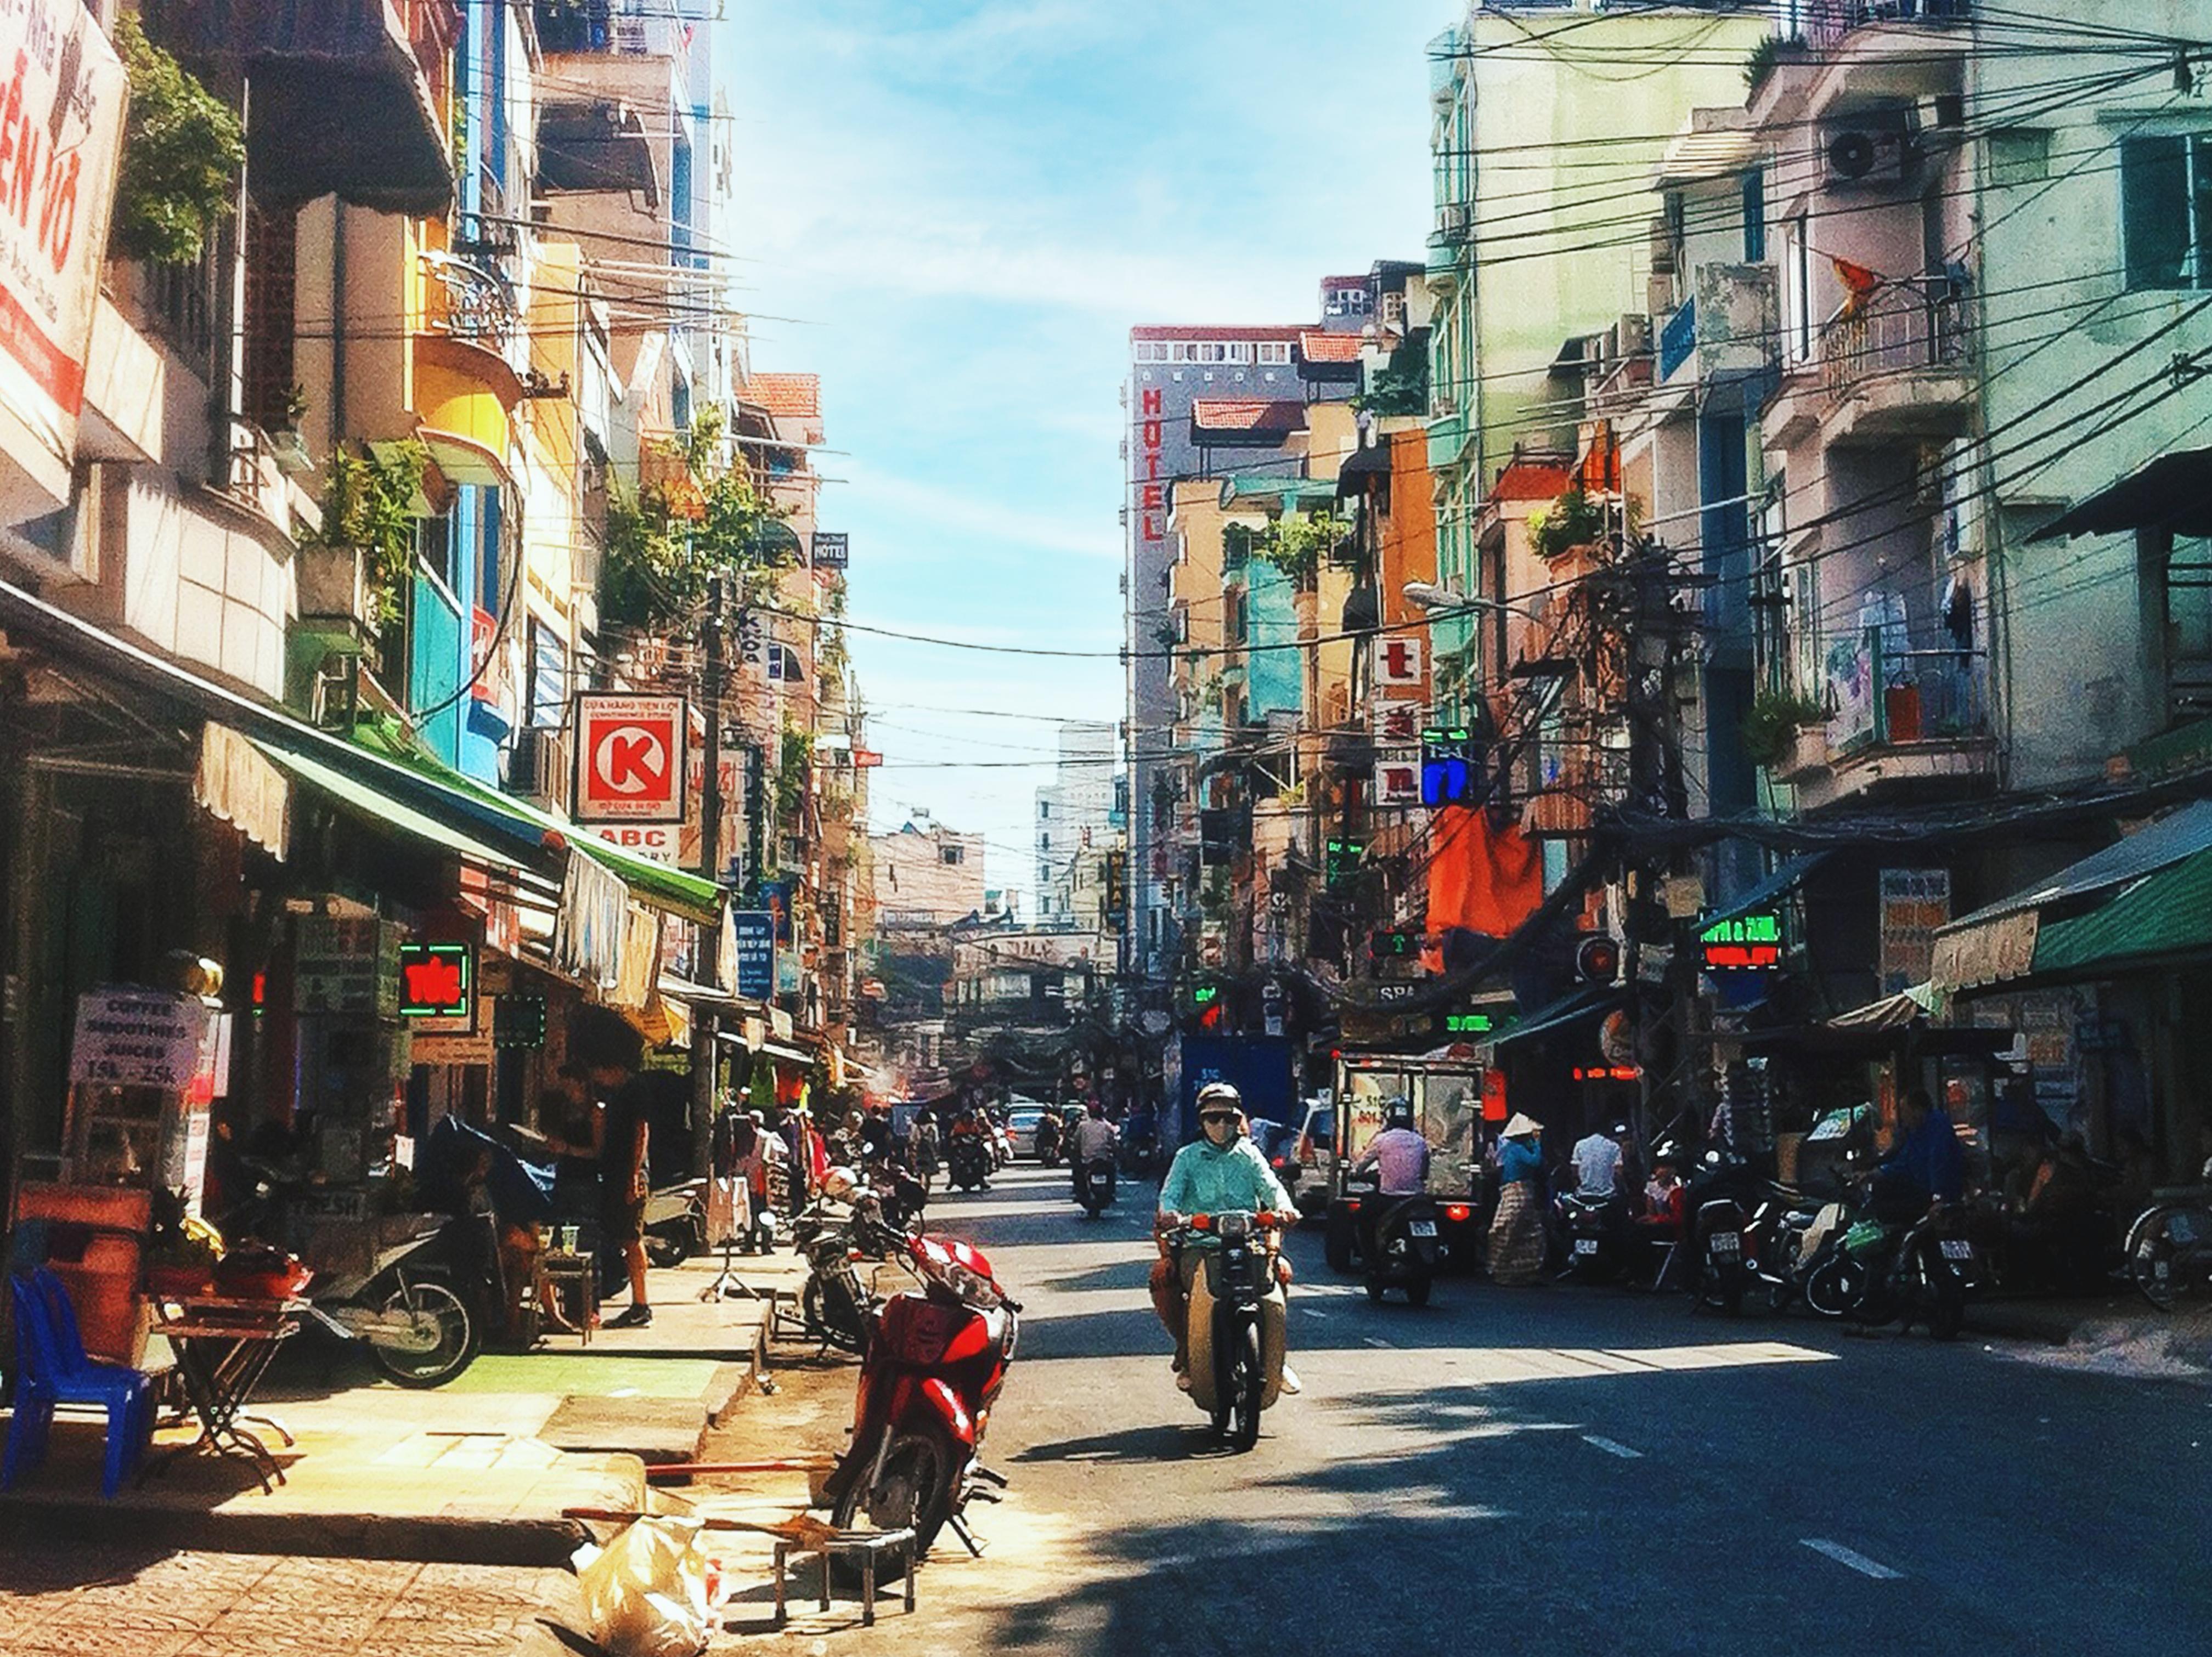 asia, vietnam, hochiminh, saigon, street, азия, вьетнам, хошимин, сайгон, улица